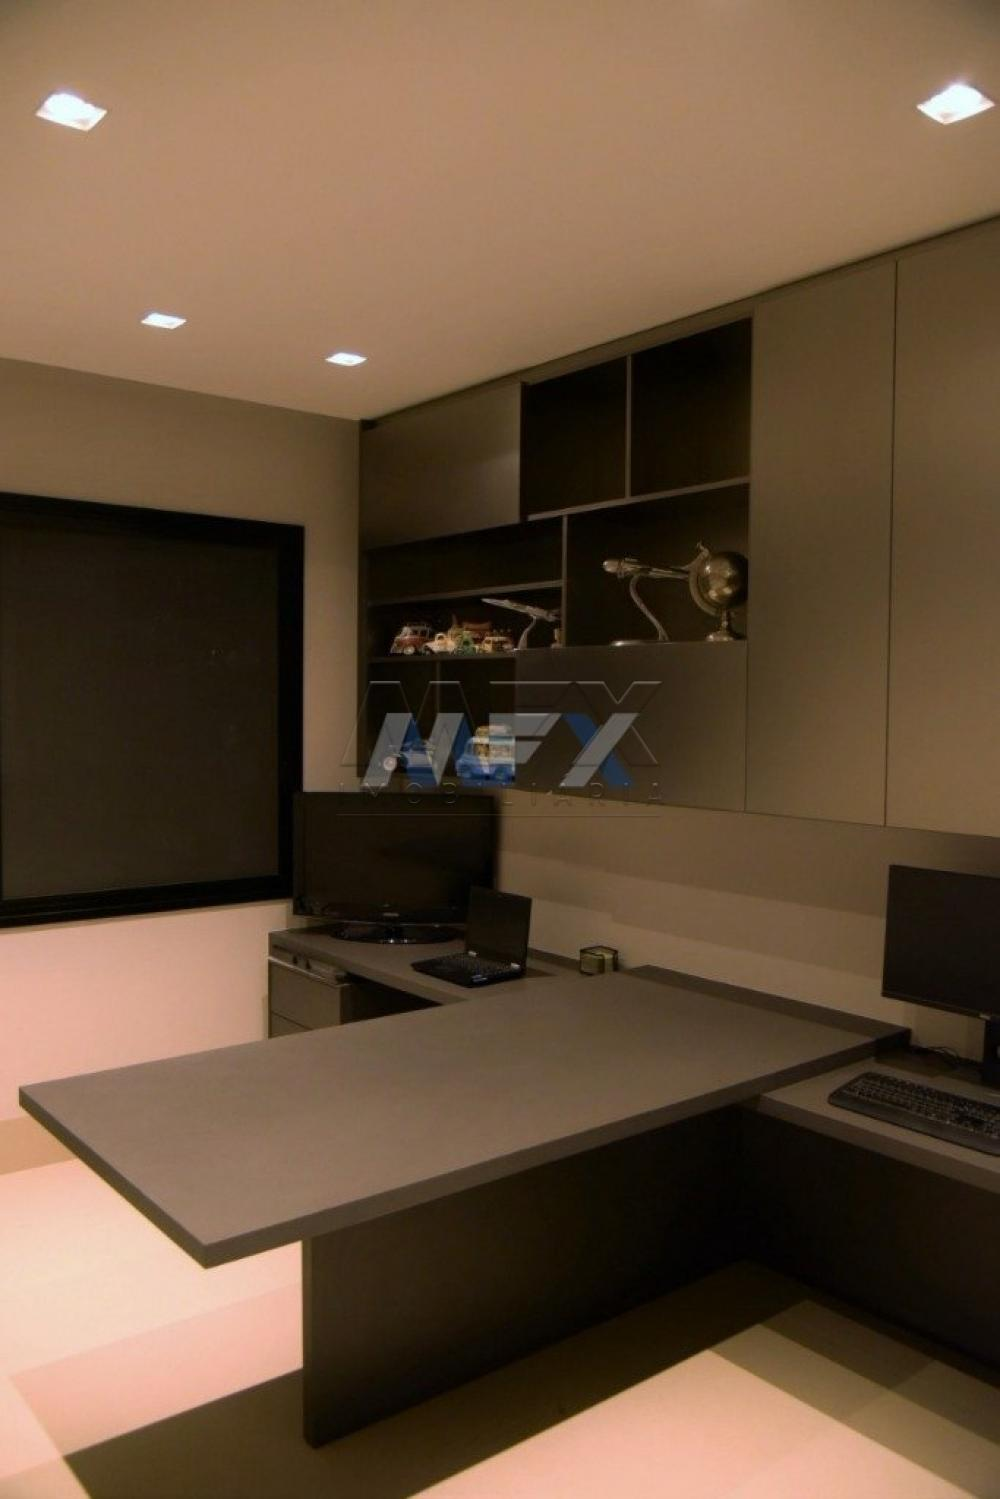 Comprar Casa / Condomínio em Bauru apenas R$ 2.900.000,00 - Foto 25